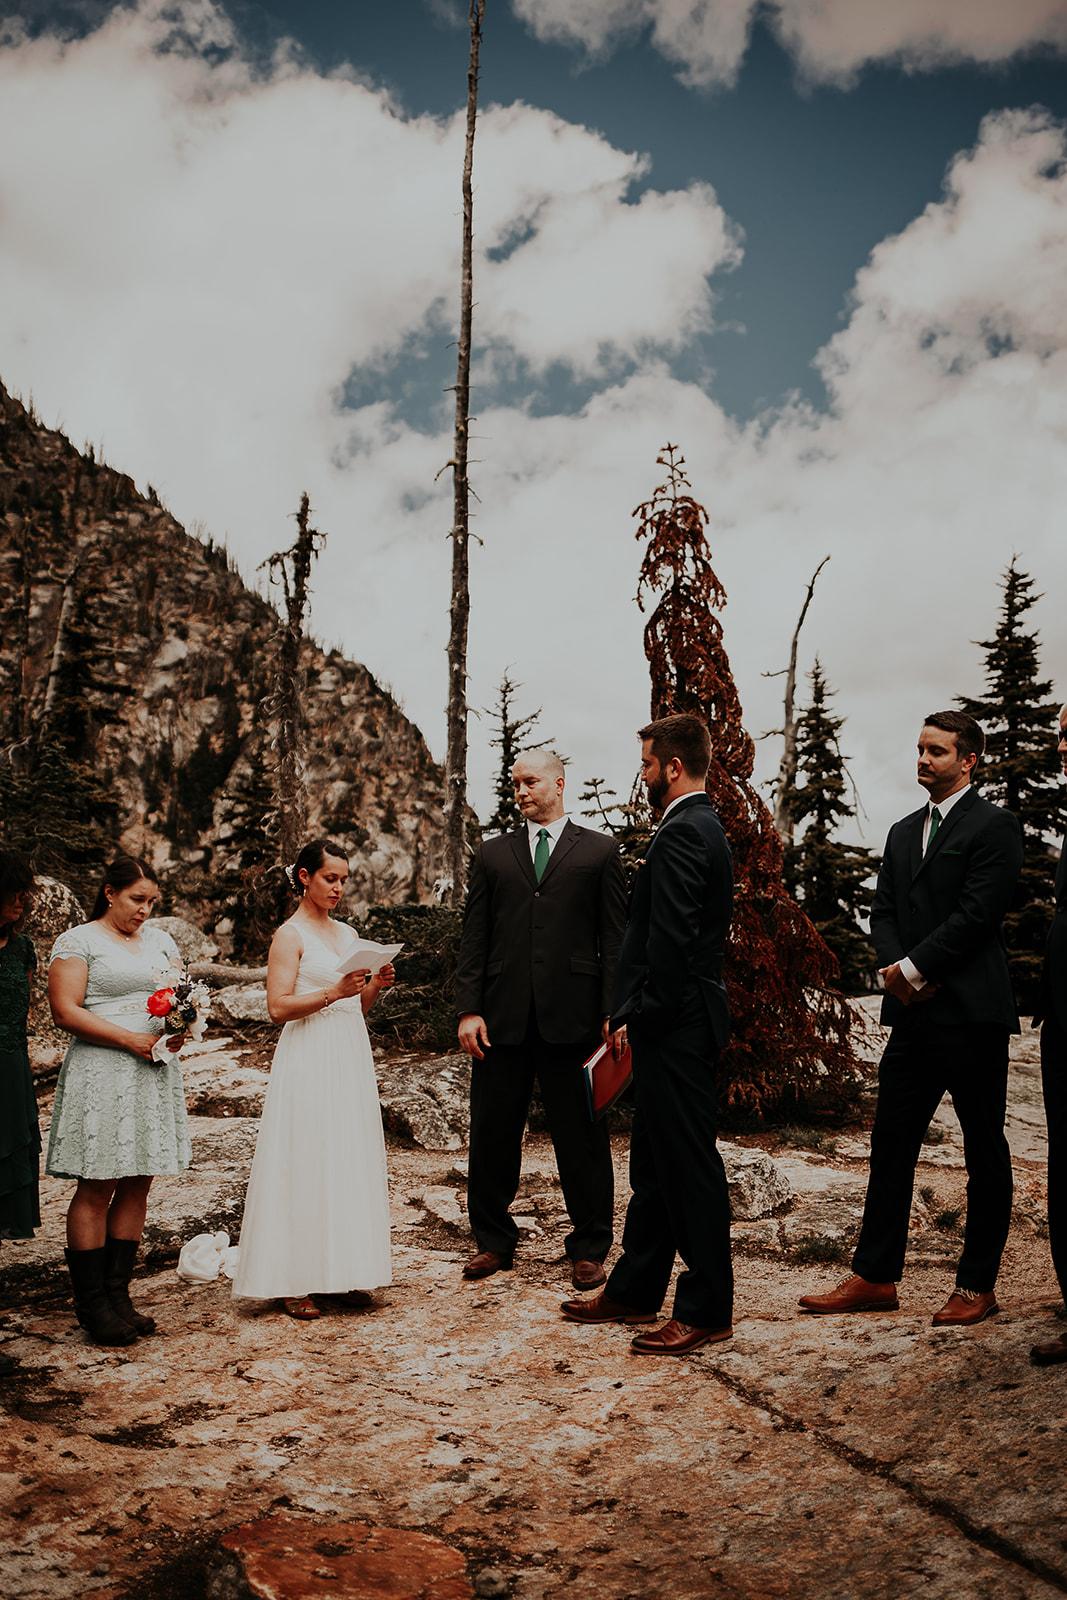 winthrop-wedding-photographer-megan-gallagher-photography (15).jpg